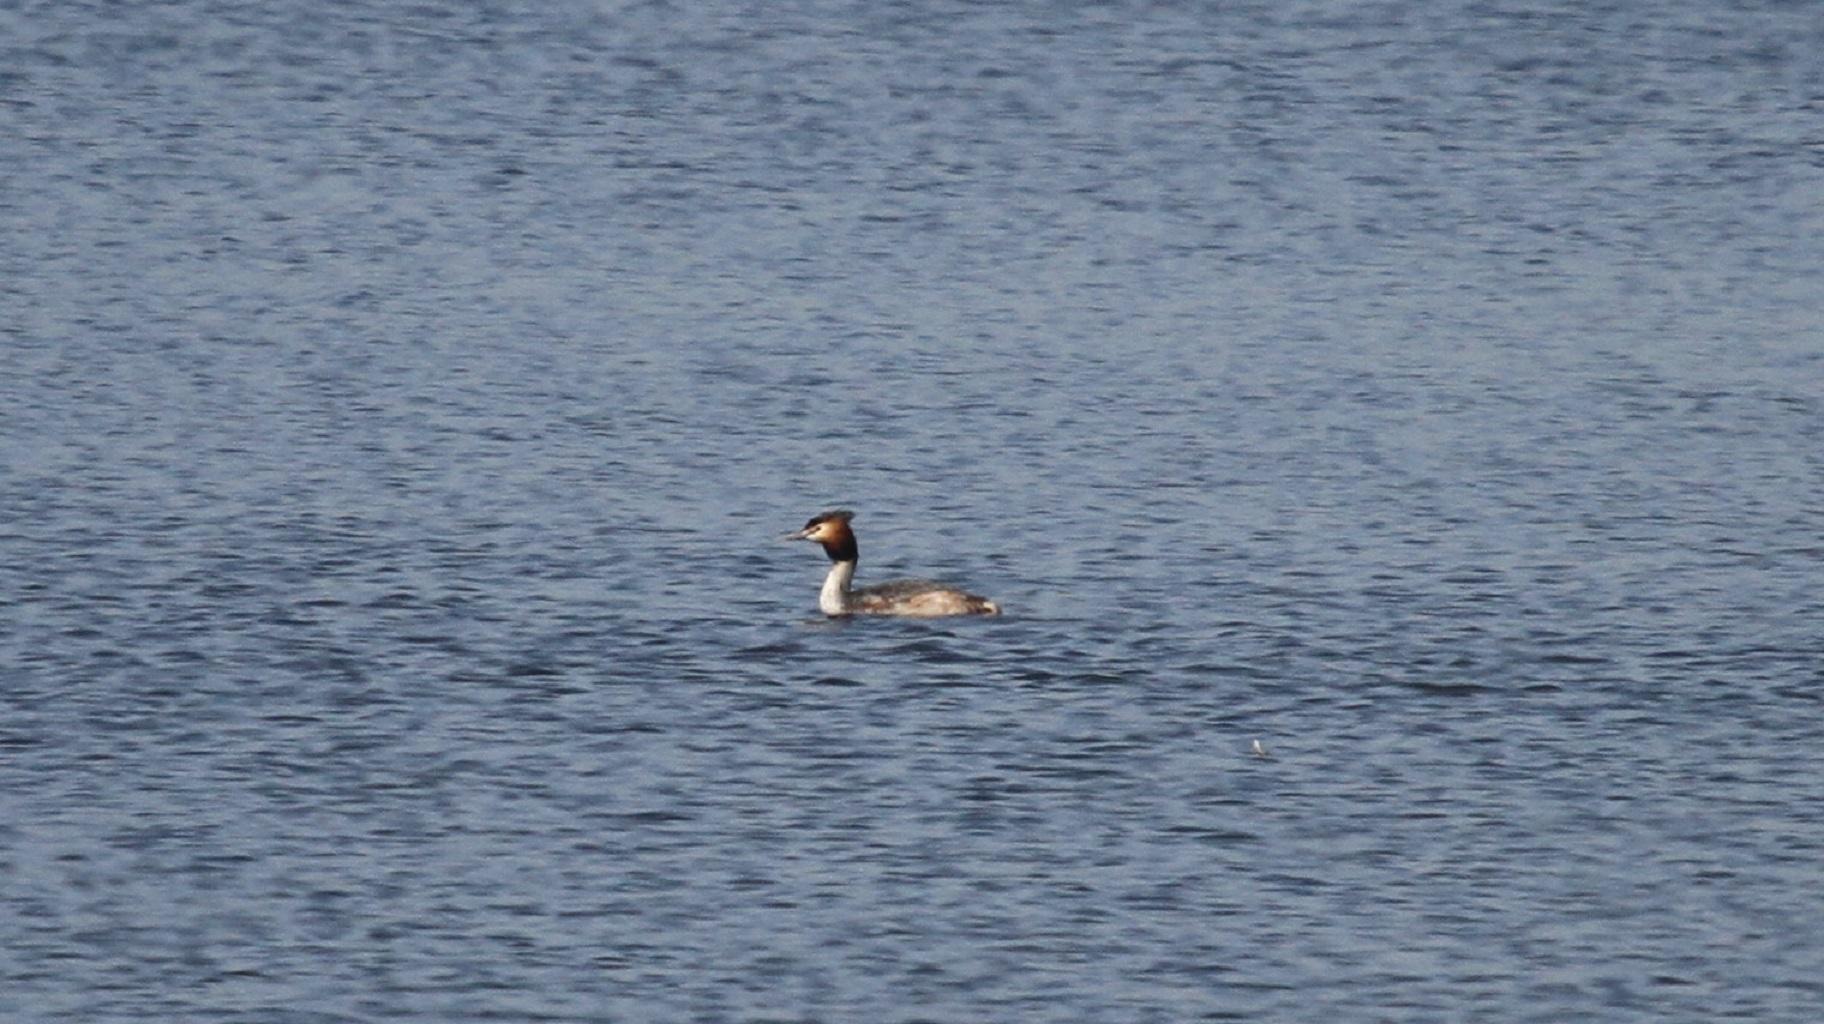 MFで出会えた、冬鳥オオジュリン冬羽から夏羽に変わりつつ_f0239515_2244055.jpg